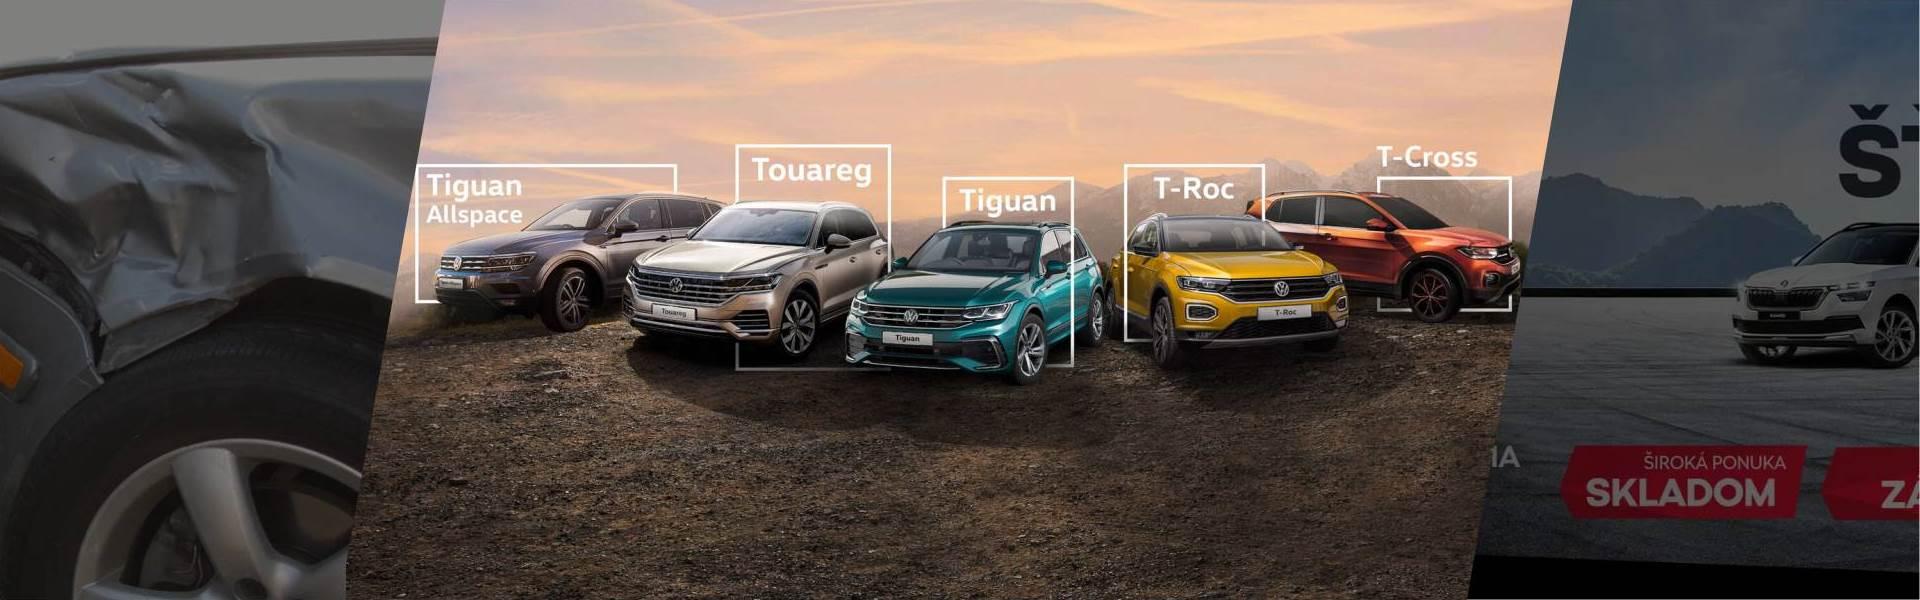 SUV modely s bonusom